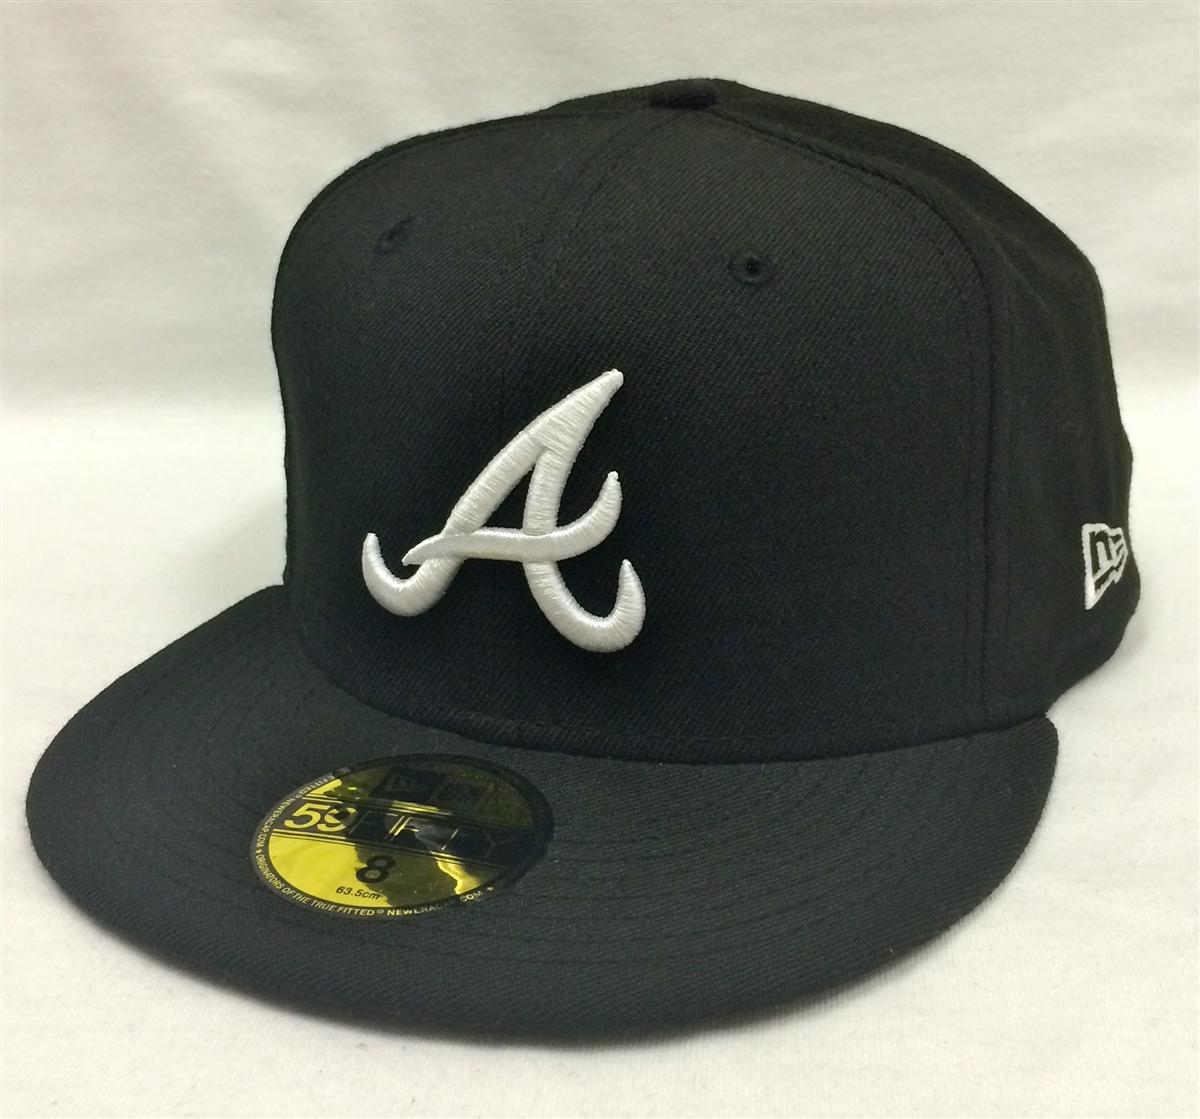 94c5b1d091418 New Era 59Fifty MLB Basic Atlanta Braves Black Fitted Cap